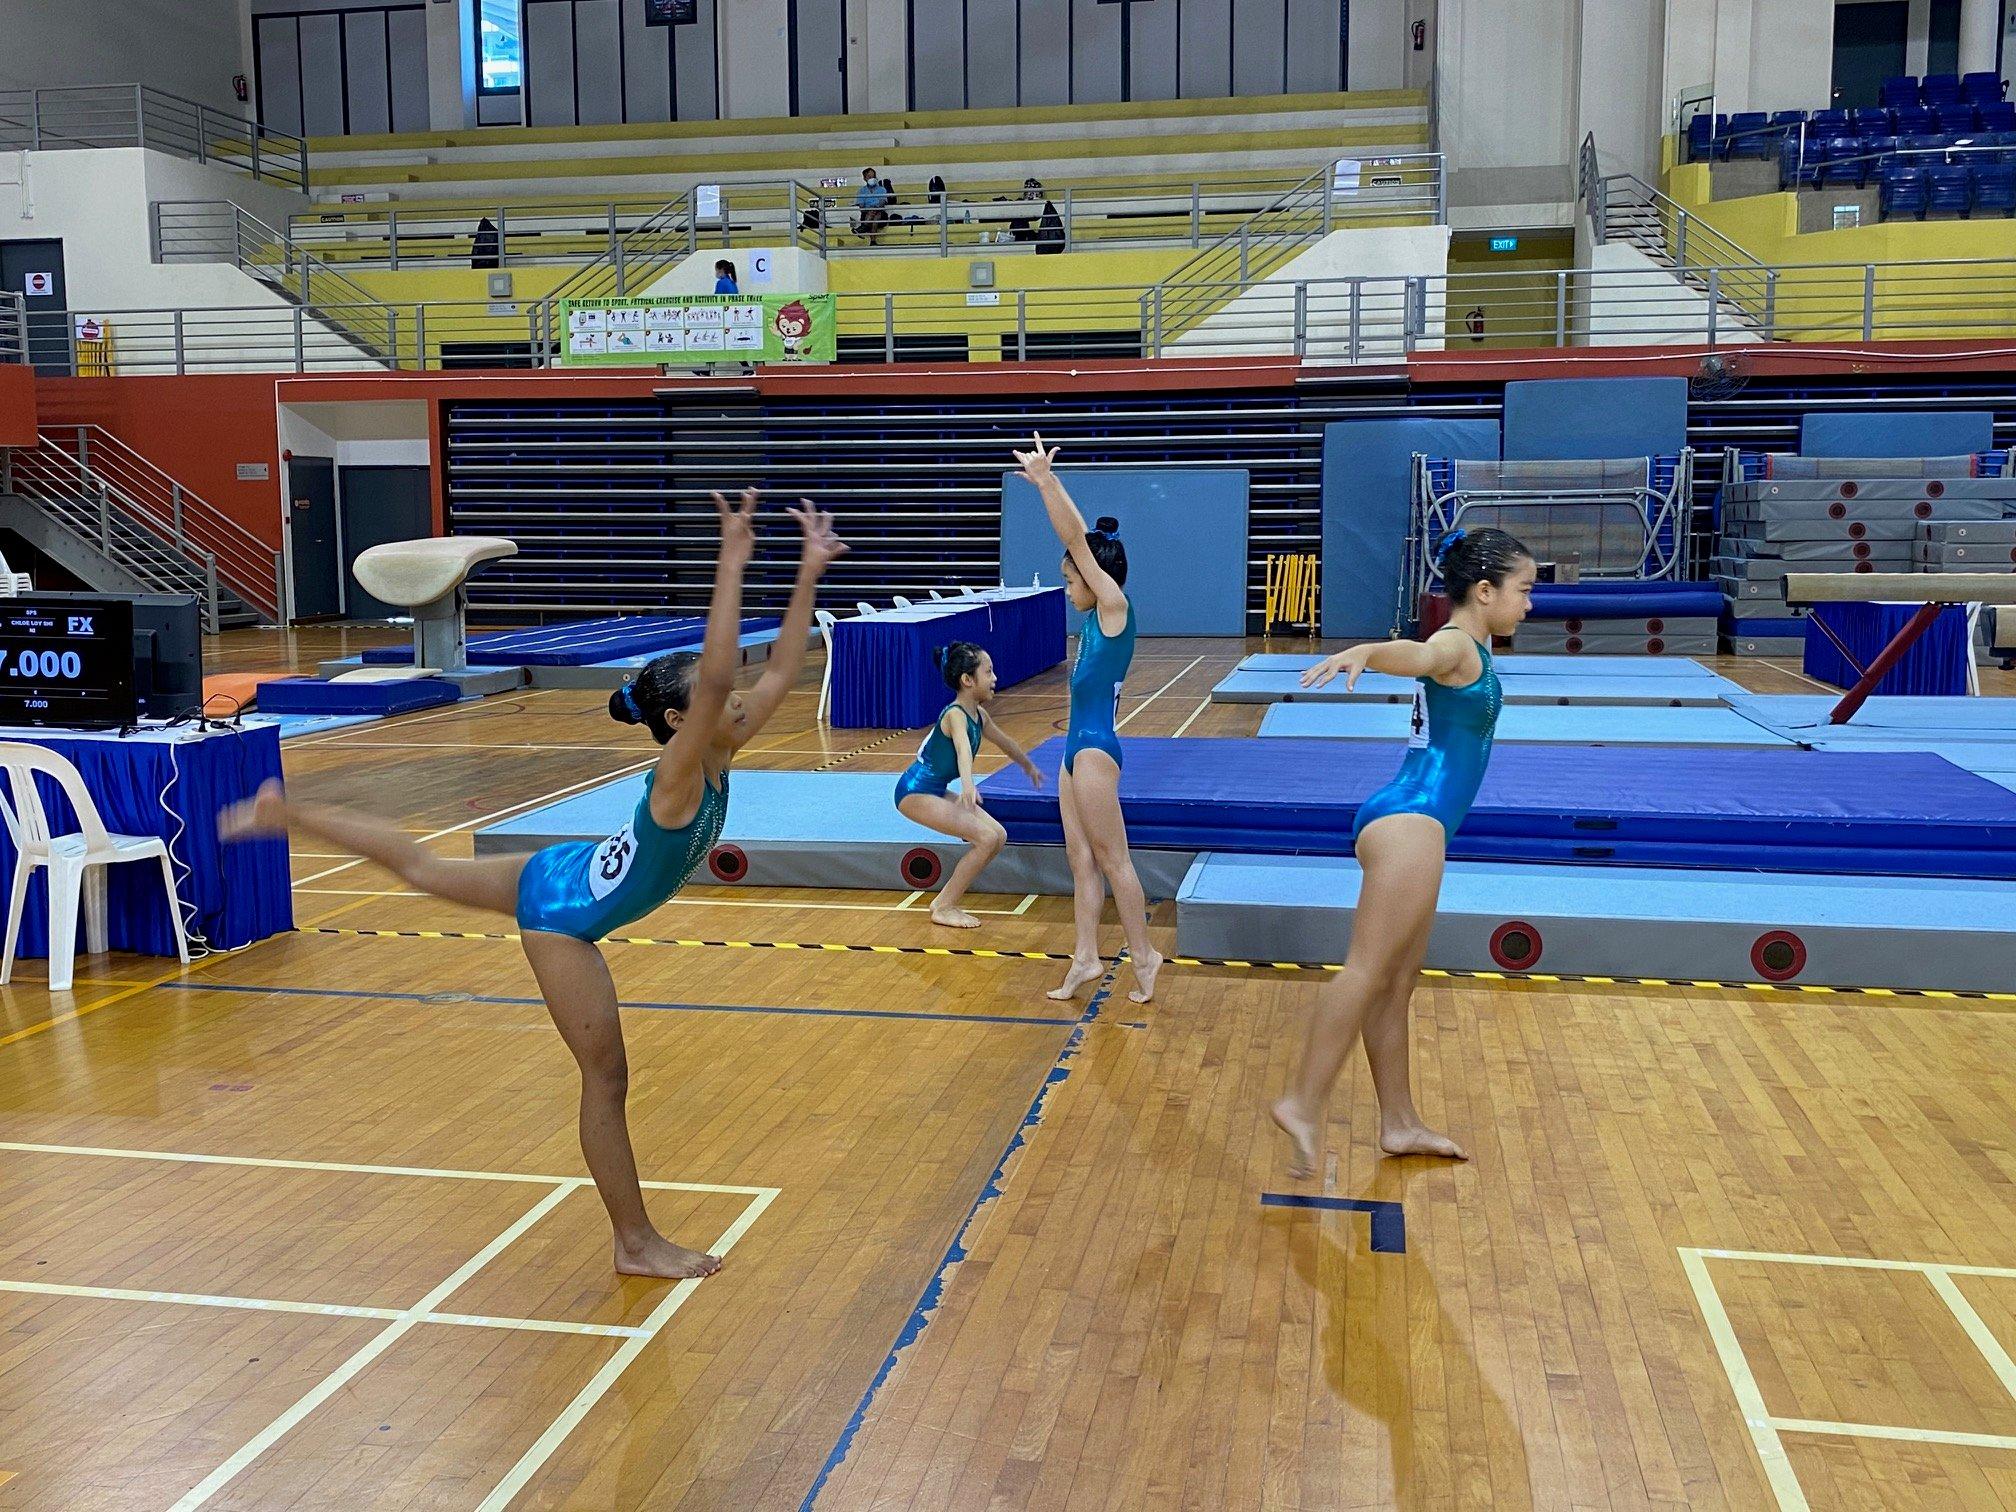 NSG Snr Div gymnastics - warm ups Marymount Convent